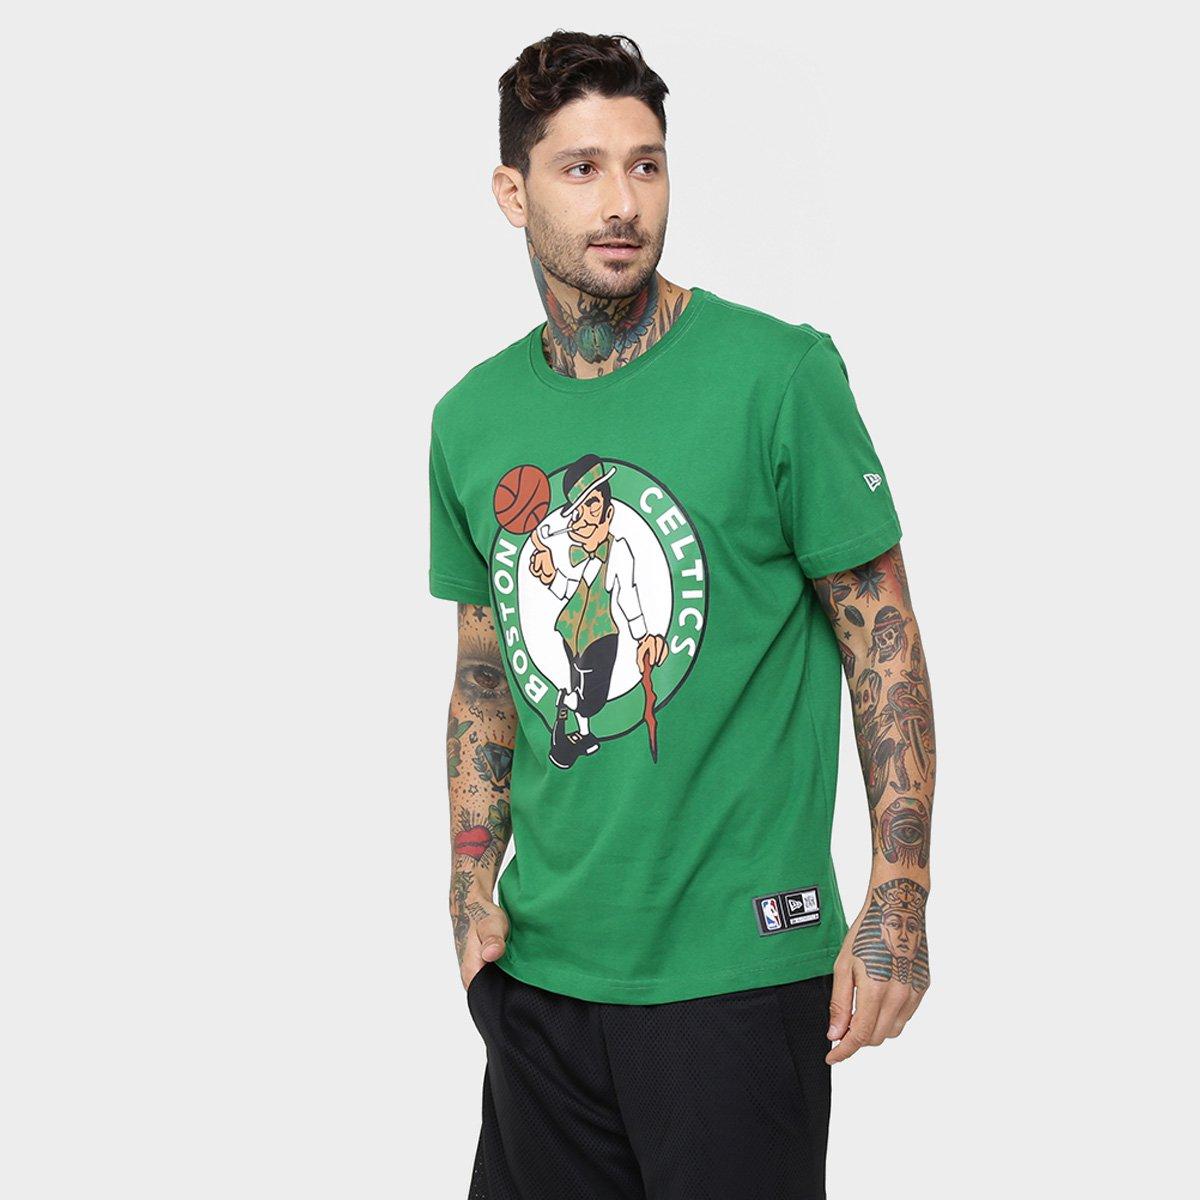 Camiseta New Era NBA Basic Logo Boston Celtics - Compre Agora  b833a6c0edaab